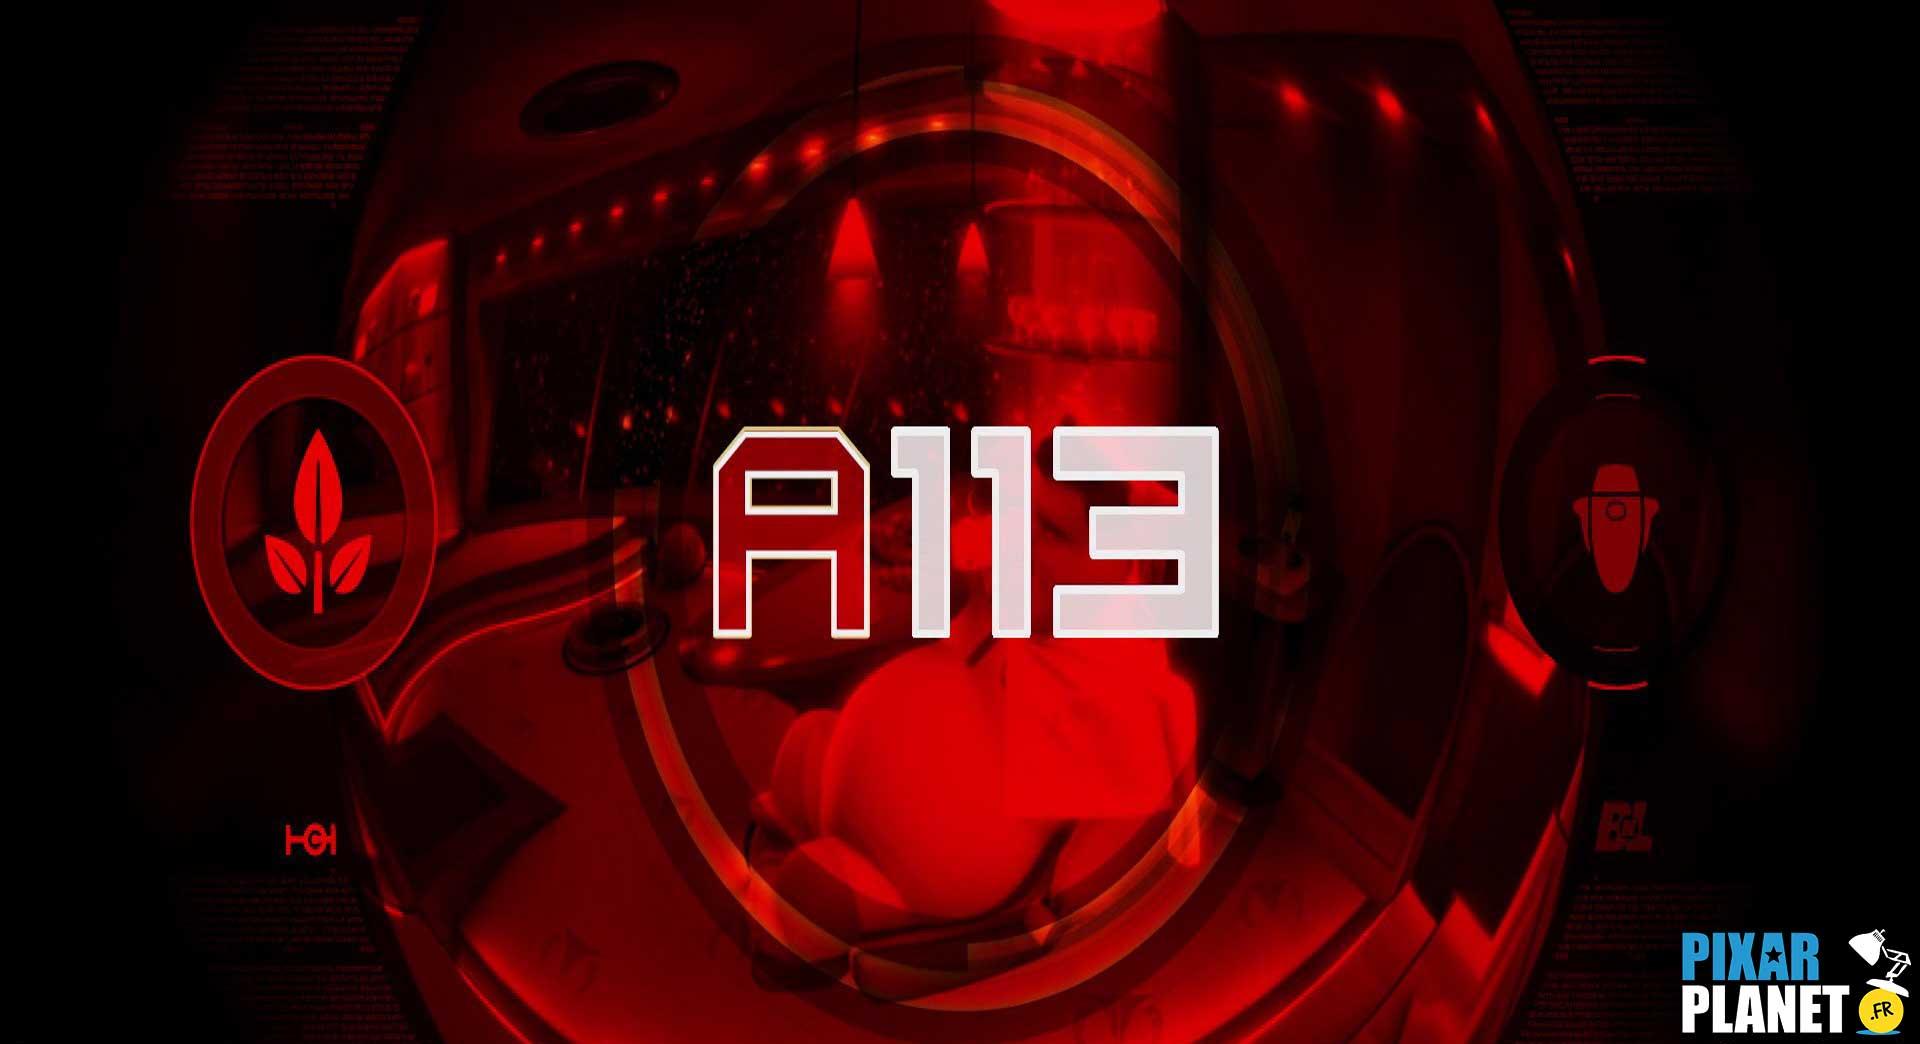 les apparitions du code a113 dans les productions pixar pixar planet fr. Black Bedroom Furniture Sets. Home Design Ideas